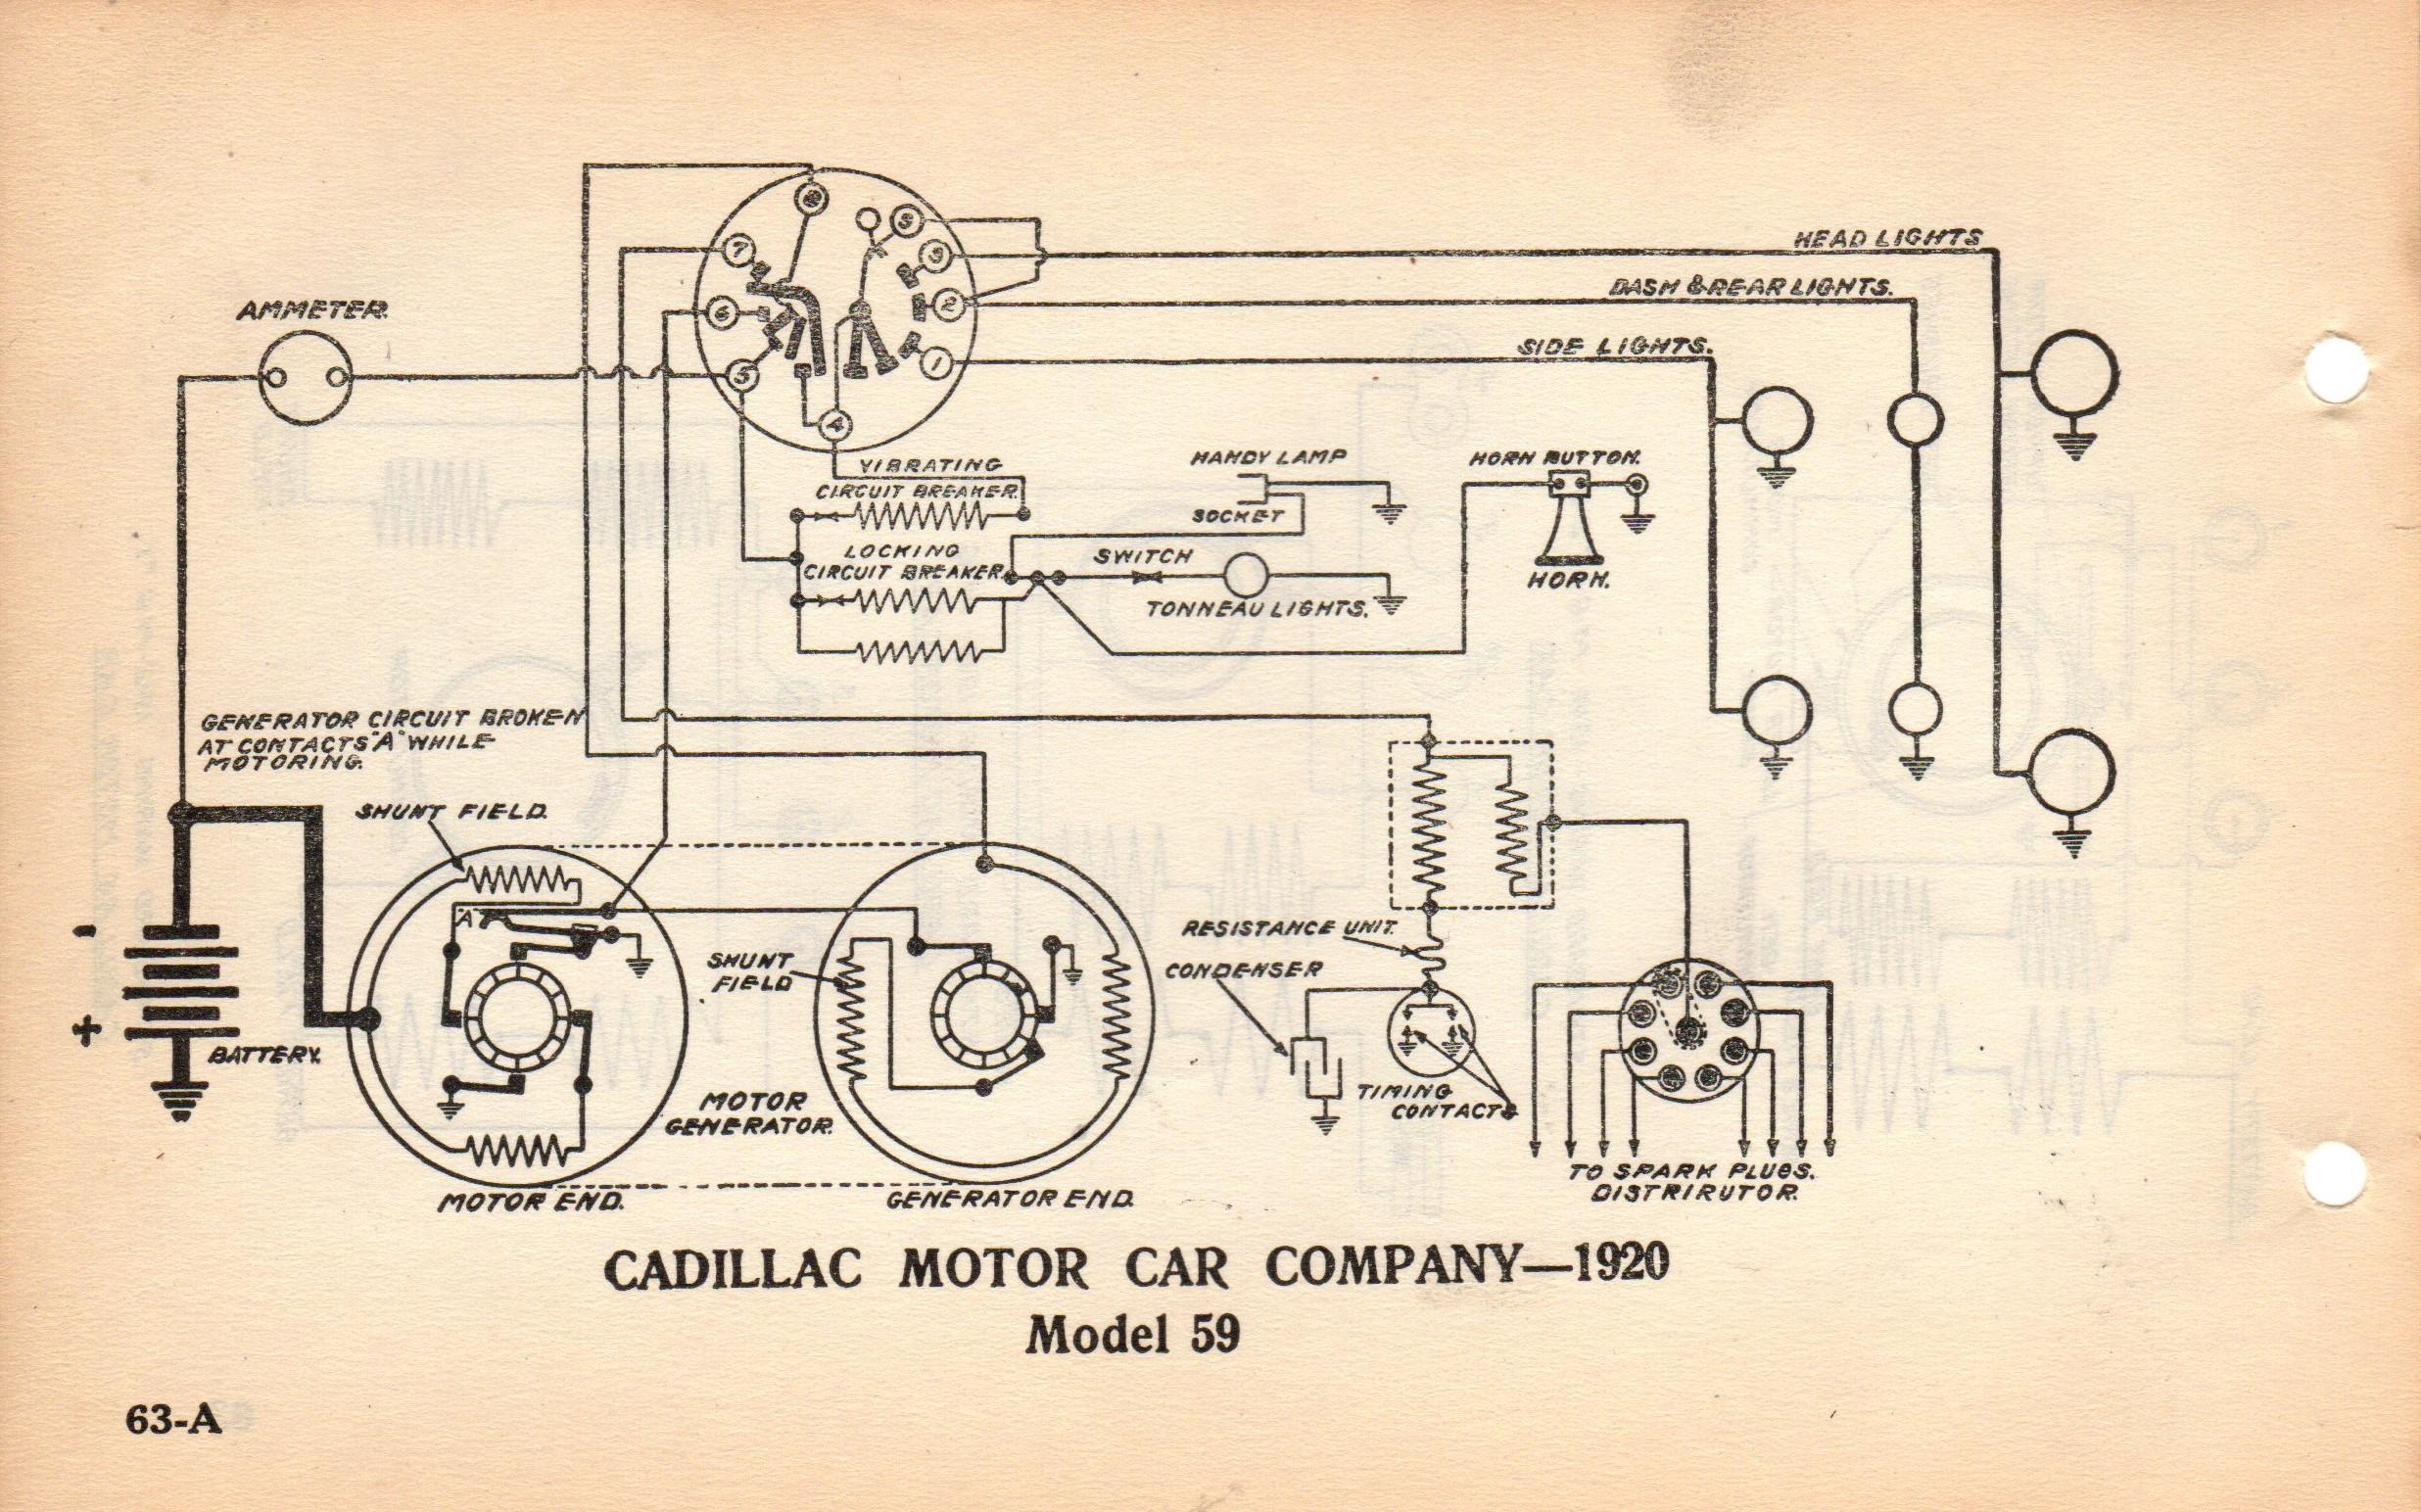 1960 lincoln wiring diagram xs 9321  1960 lincoln wiring diagram  xs 9321  1960 lincoln wiring diagram